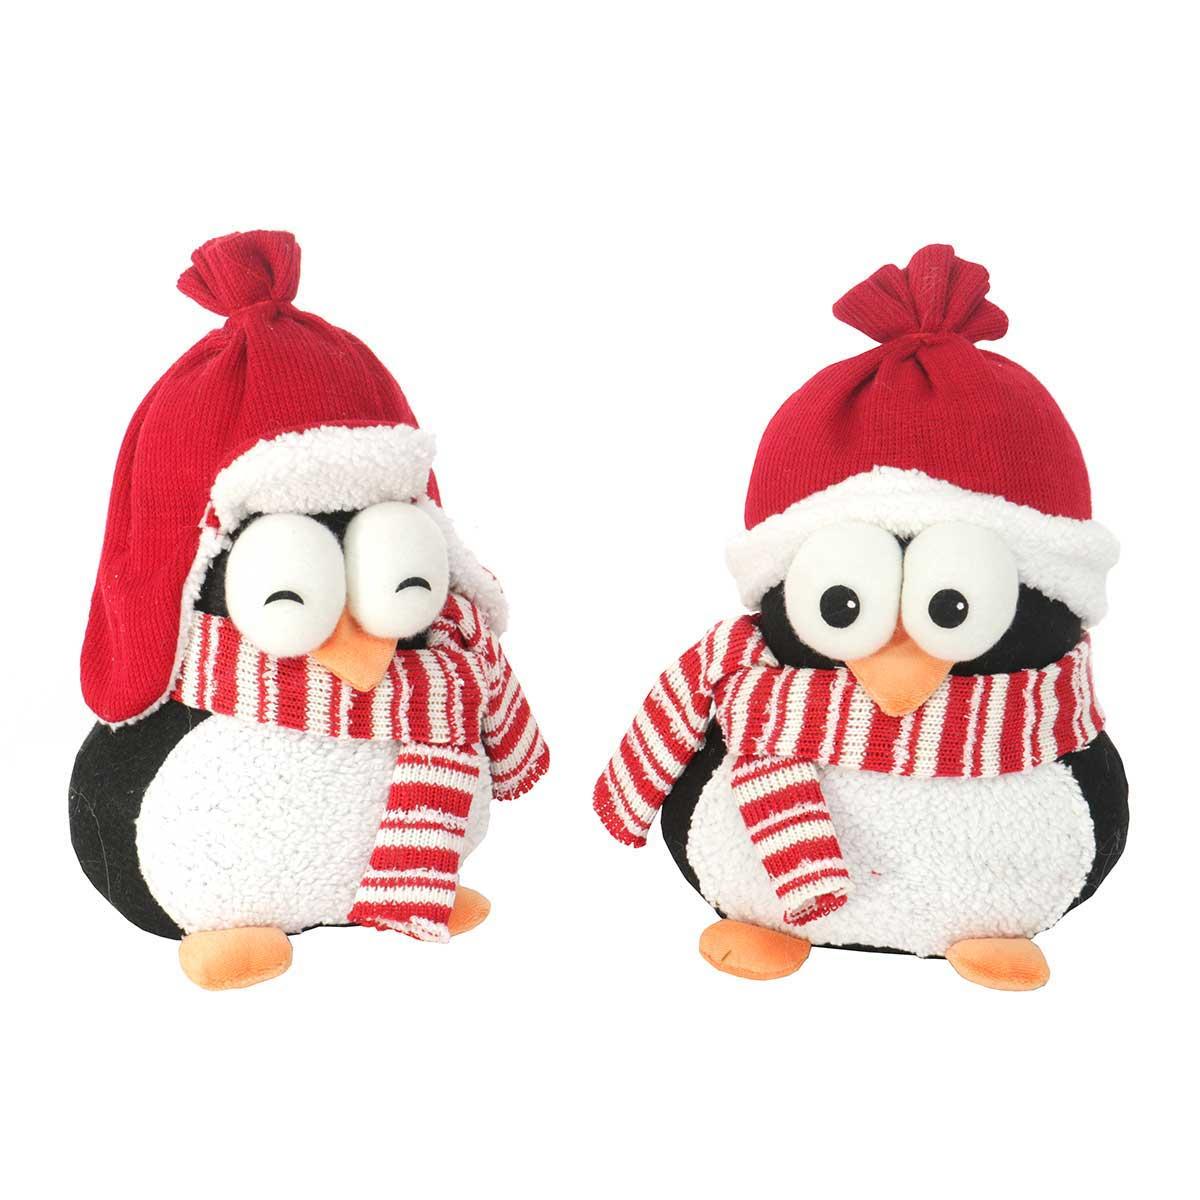 2 Piece Penguin Collectible Set Stocking